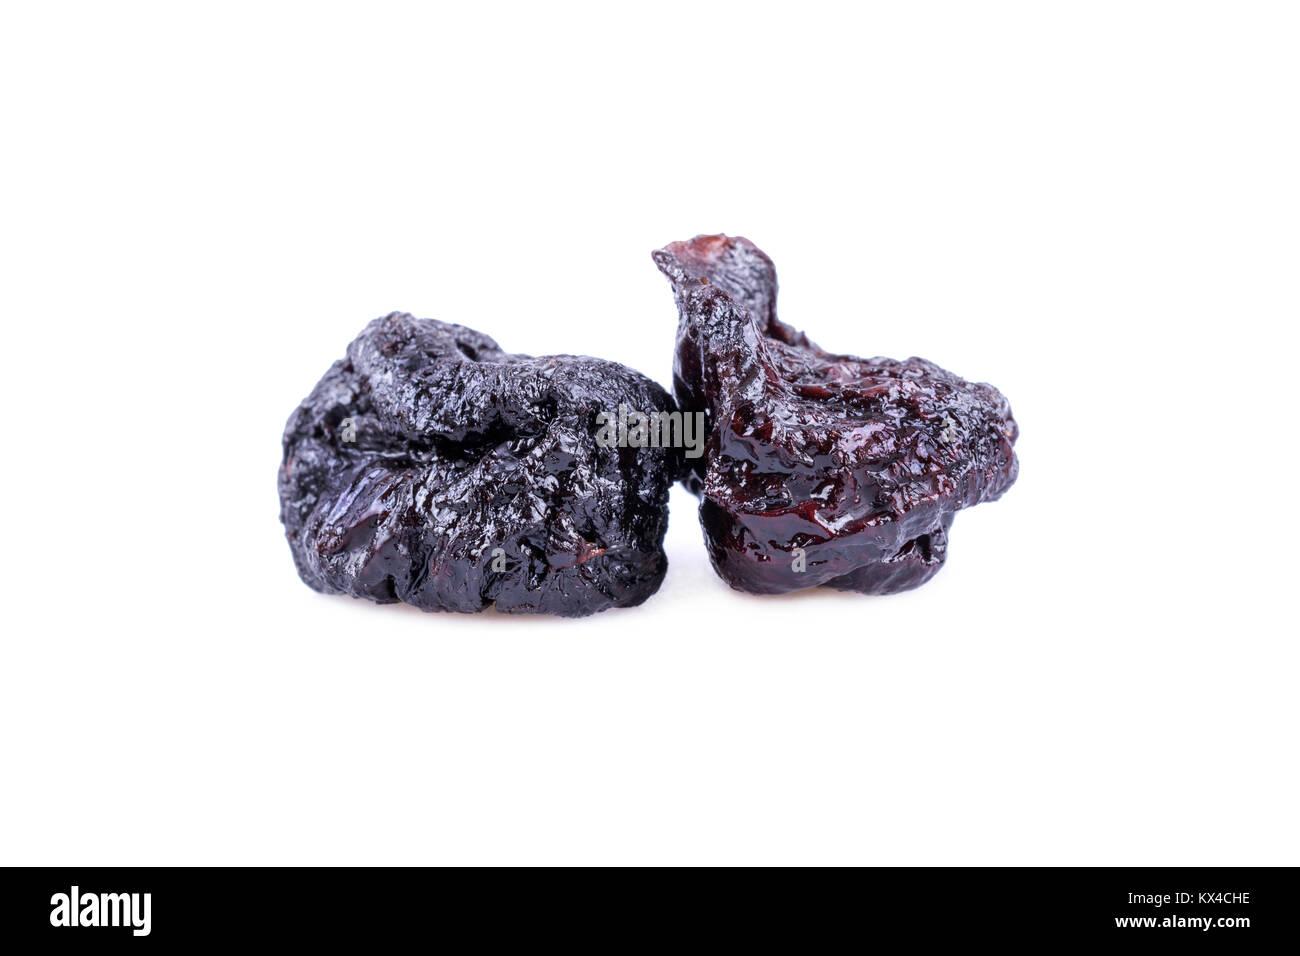 Dried prune in closeup - Stock Image